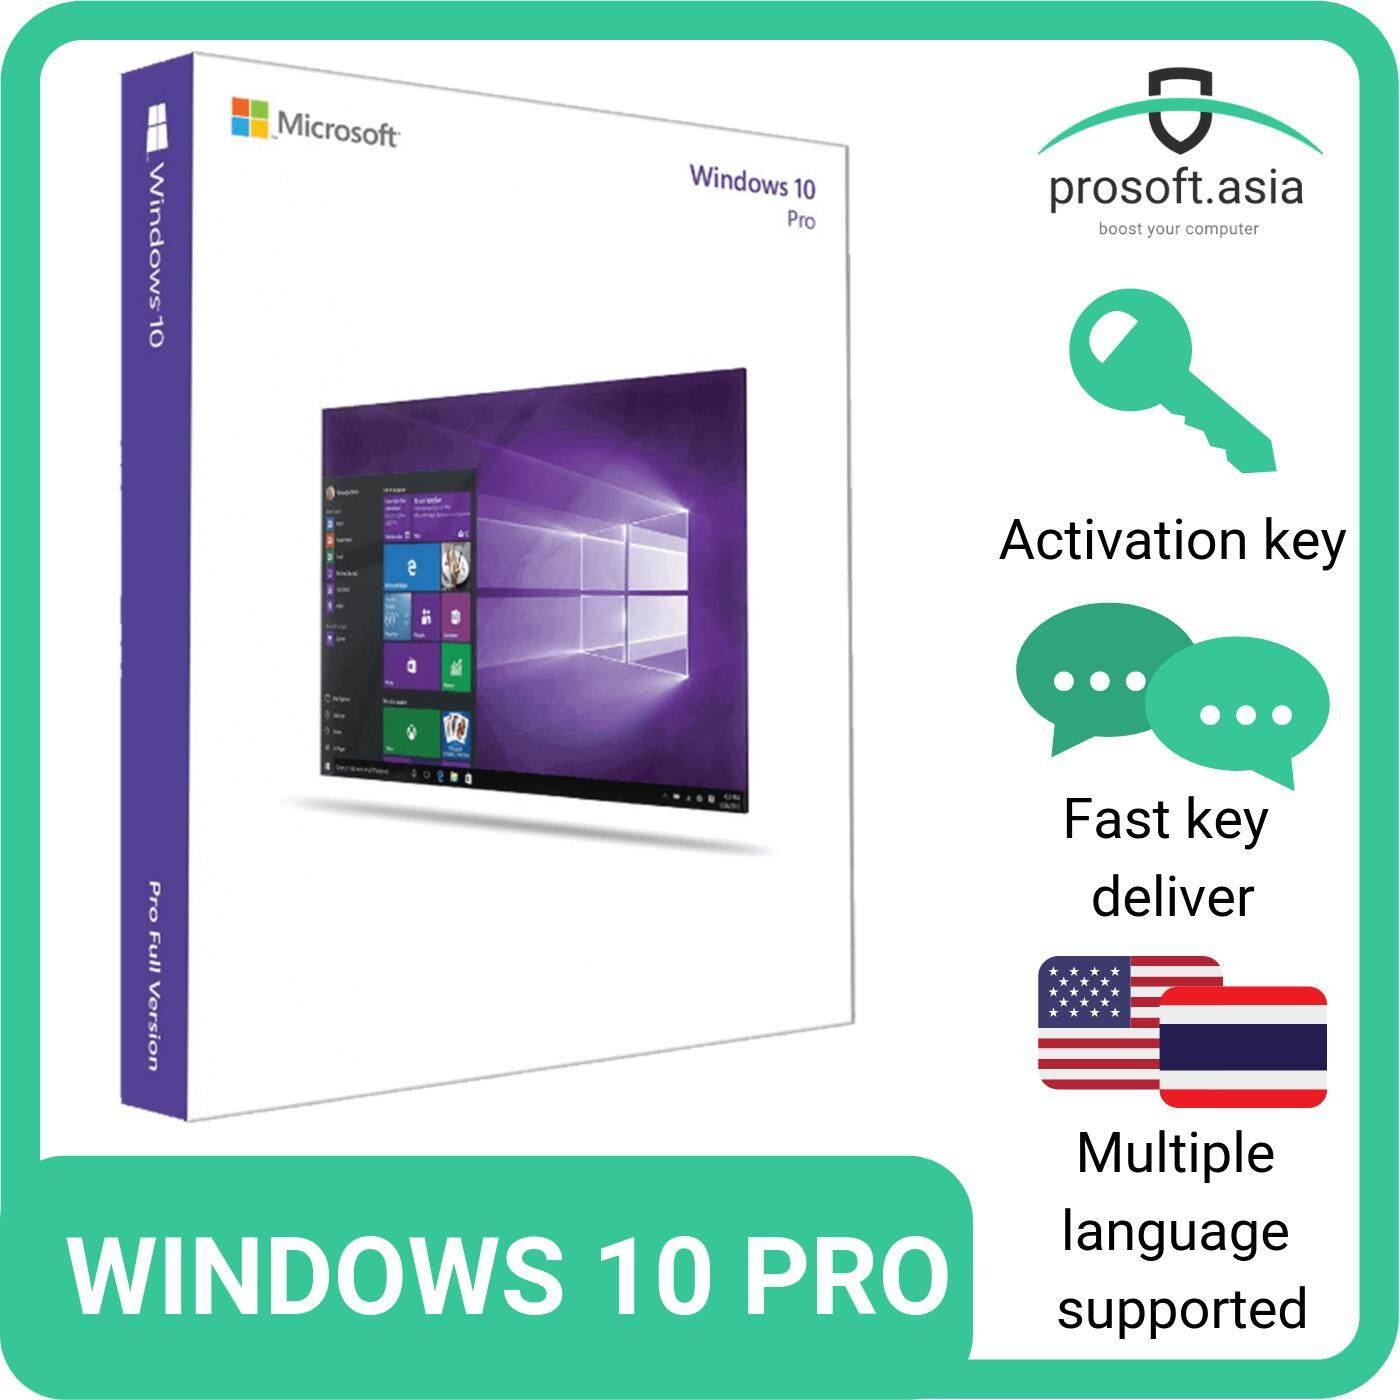 Windows 10 Pro Key 32/64 Bit จากไมโครซอฟต์พาทเนอร์ การันตี 100% By Prosoft.asia.